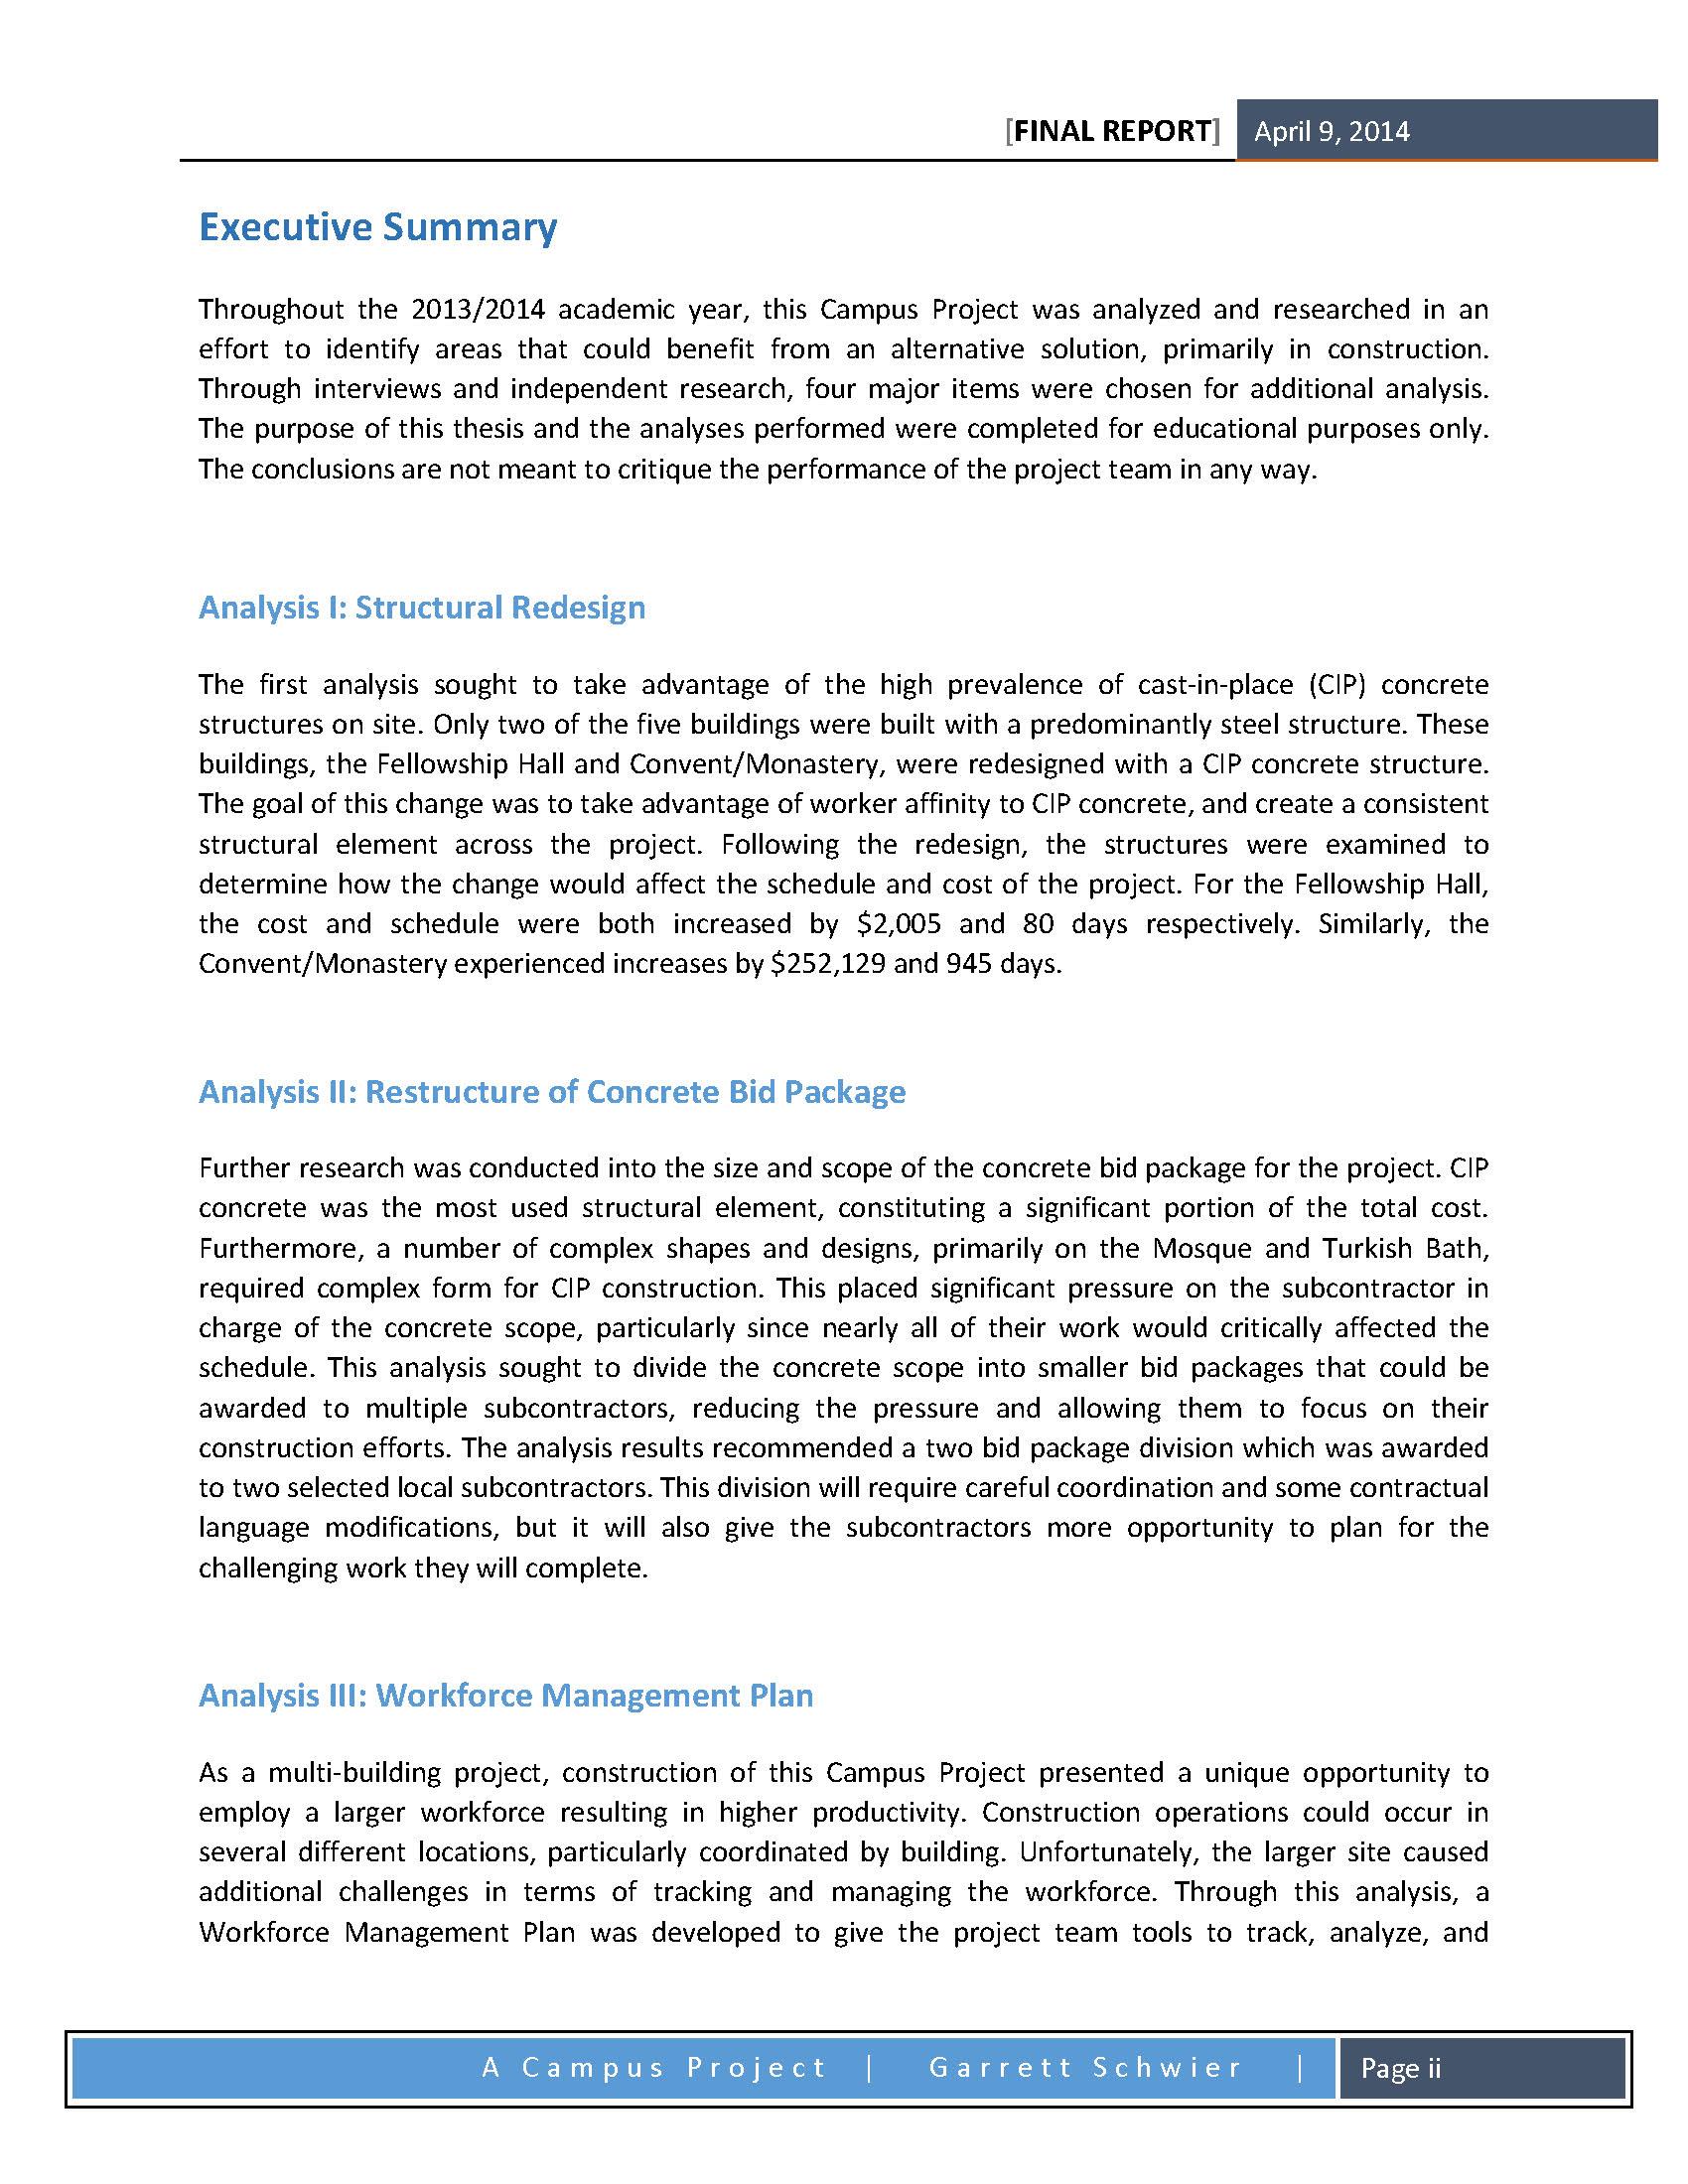 CPEP - Final Report